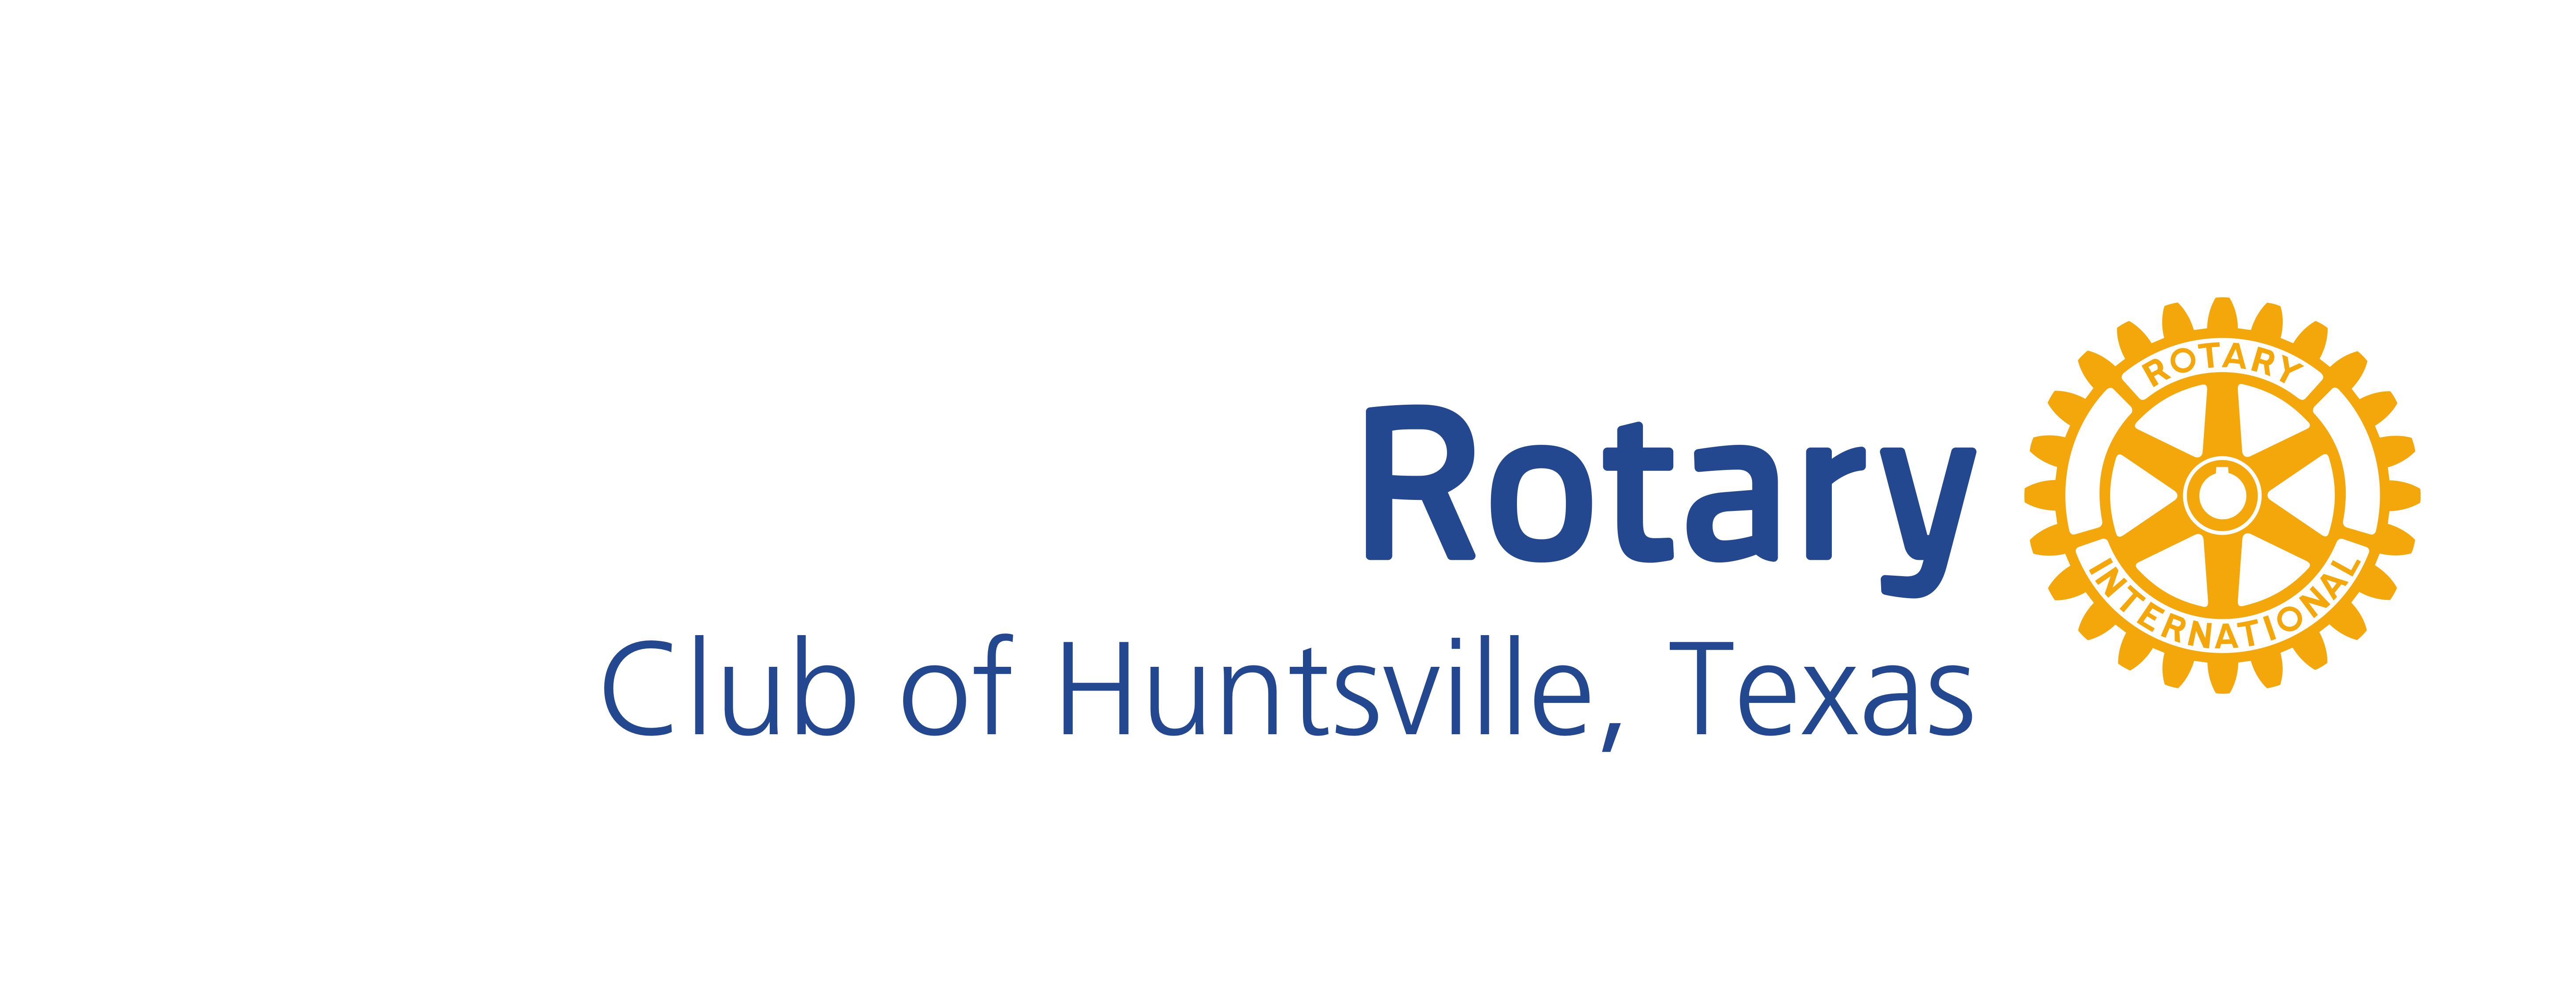 Rotary Club of Huntsville Texas Logo